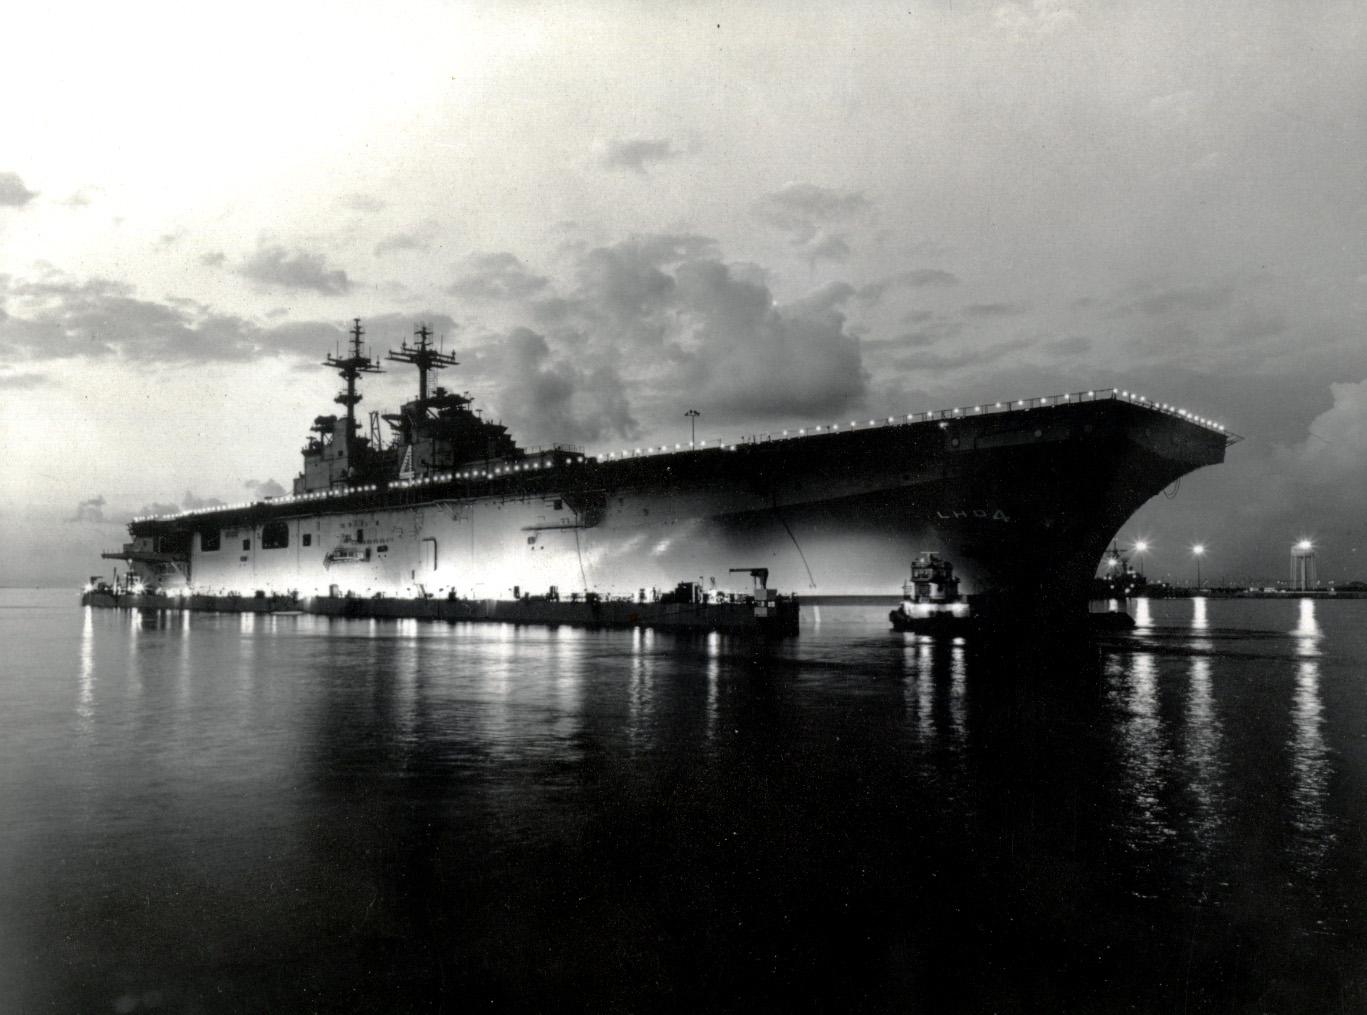 USS Boxer (LHD-4)